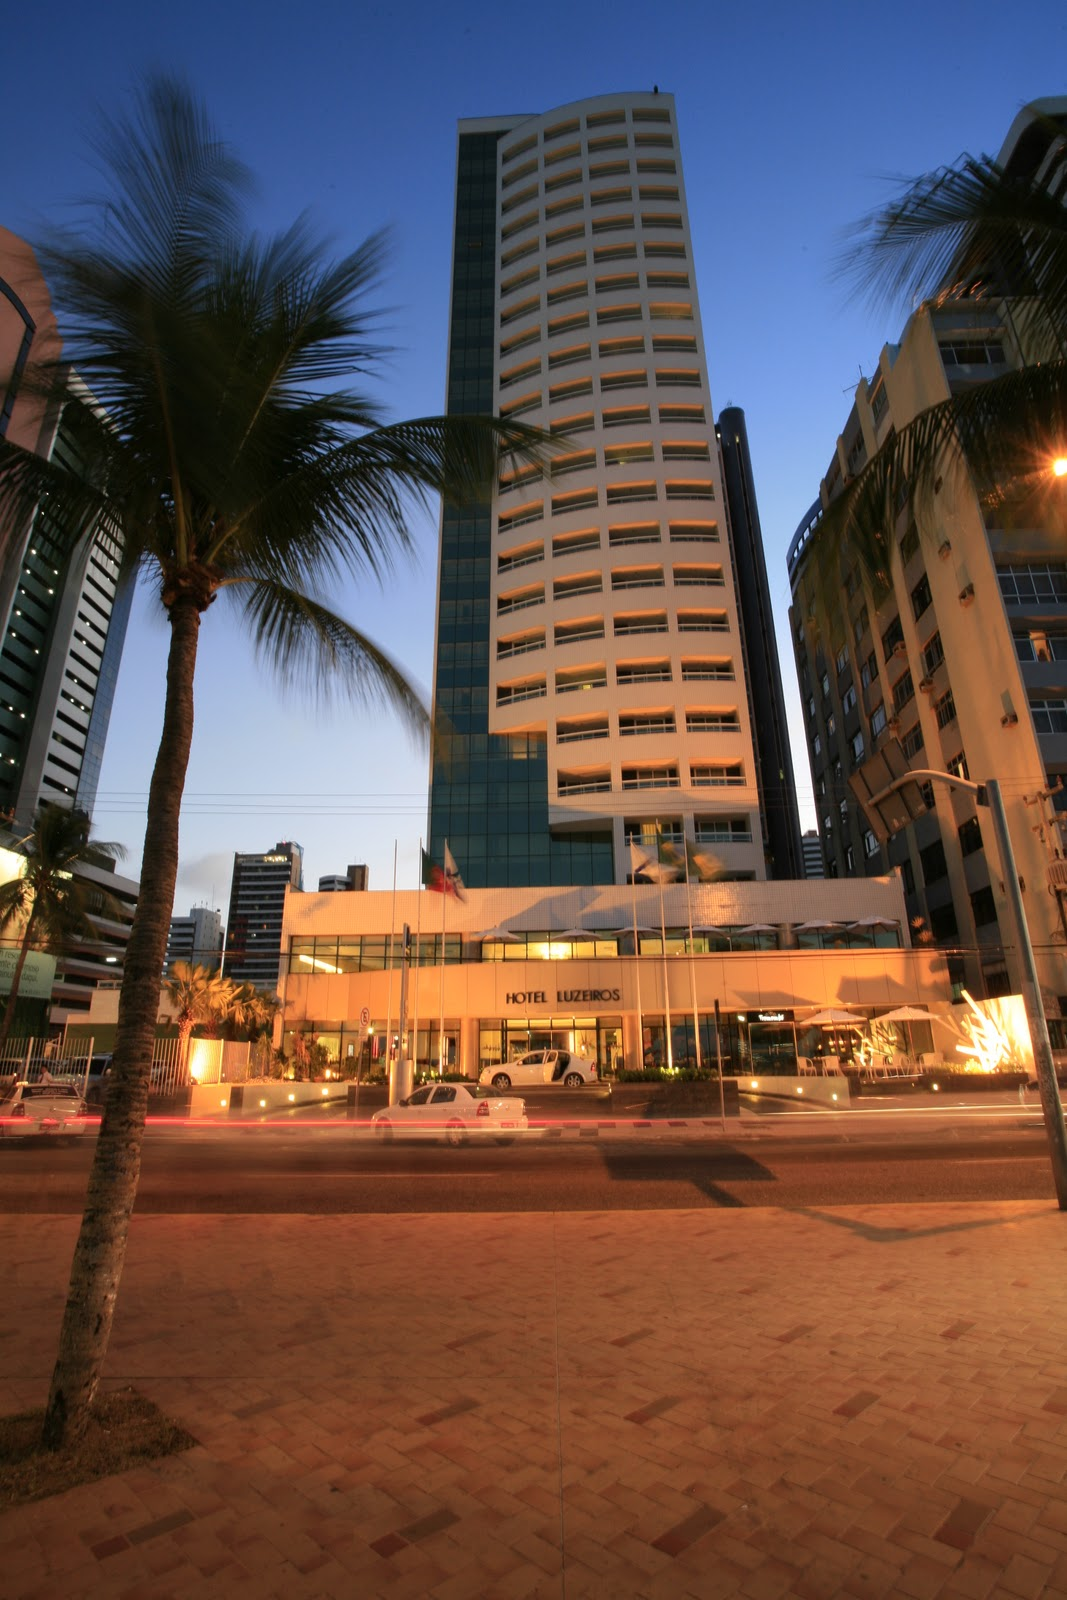 O VIAJANTE ESPECIAL Hotel Luzeiros  Fortaleza  CE